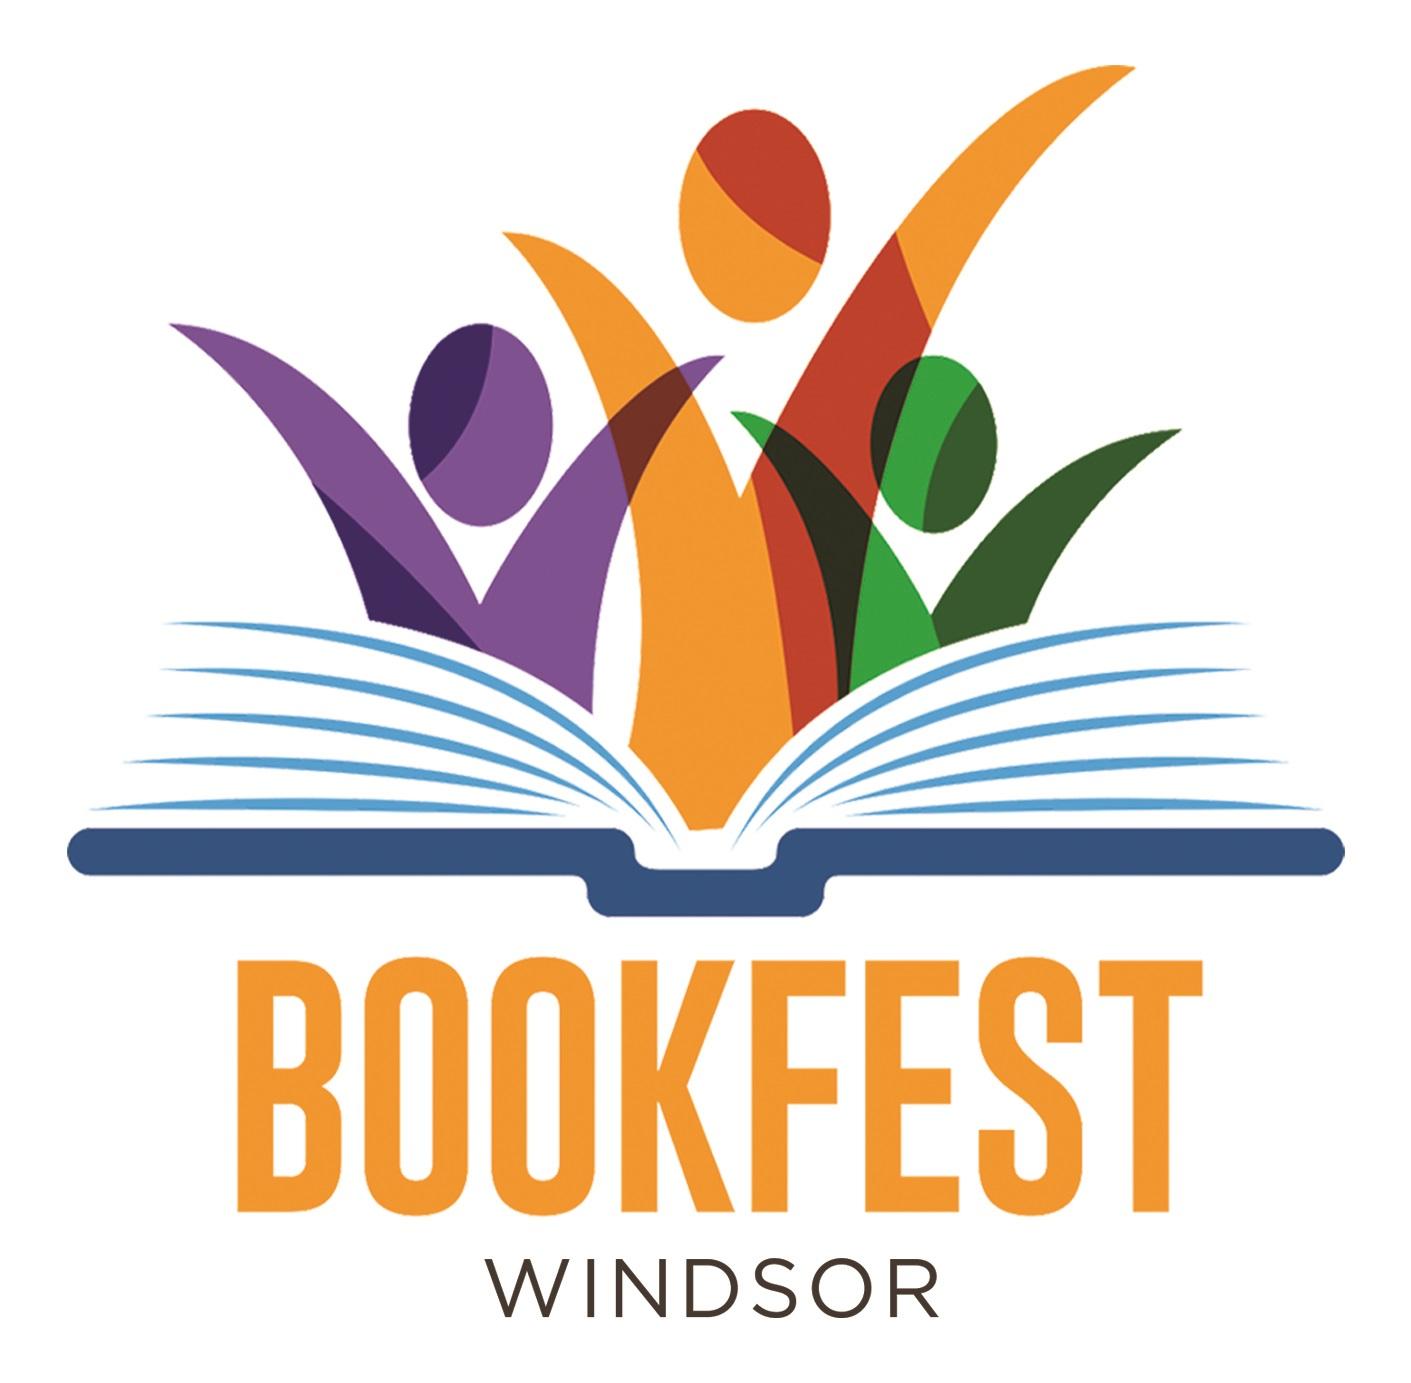 Bookfest Windsor